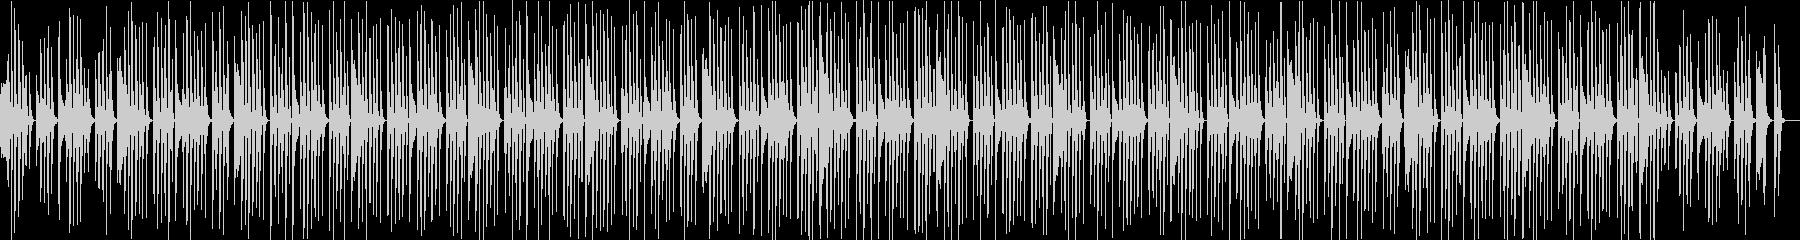 kawaiiポップオーケストラ・日常の未再生の波形